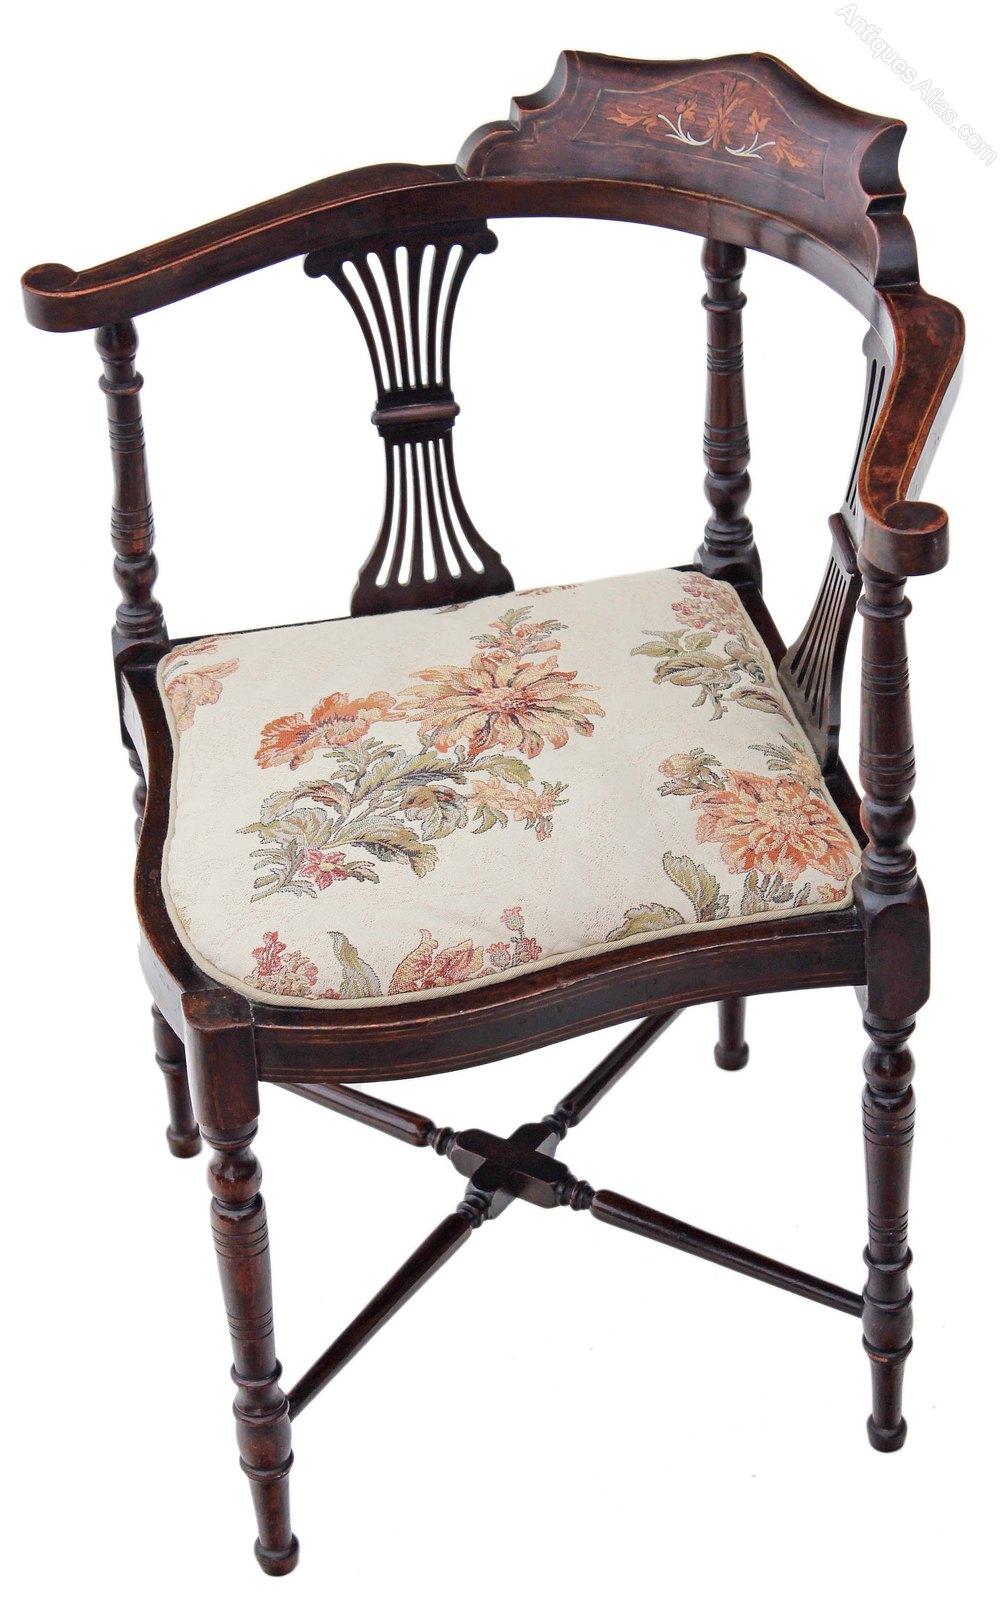 Edwardian Inlaid Mahogany Corner Chair Side Hall